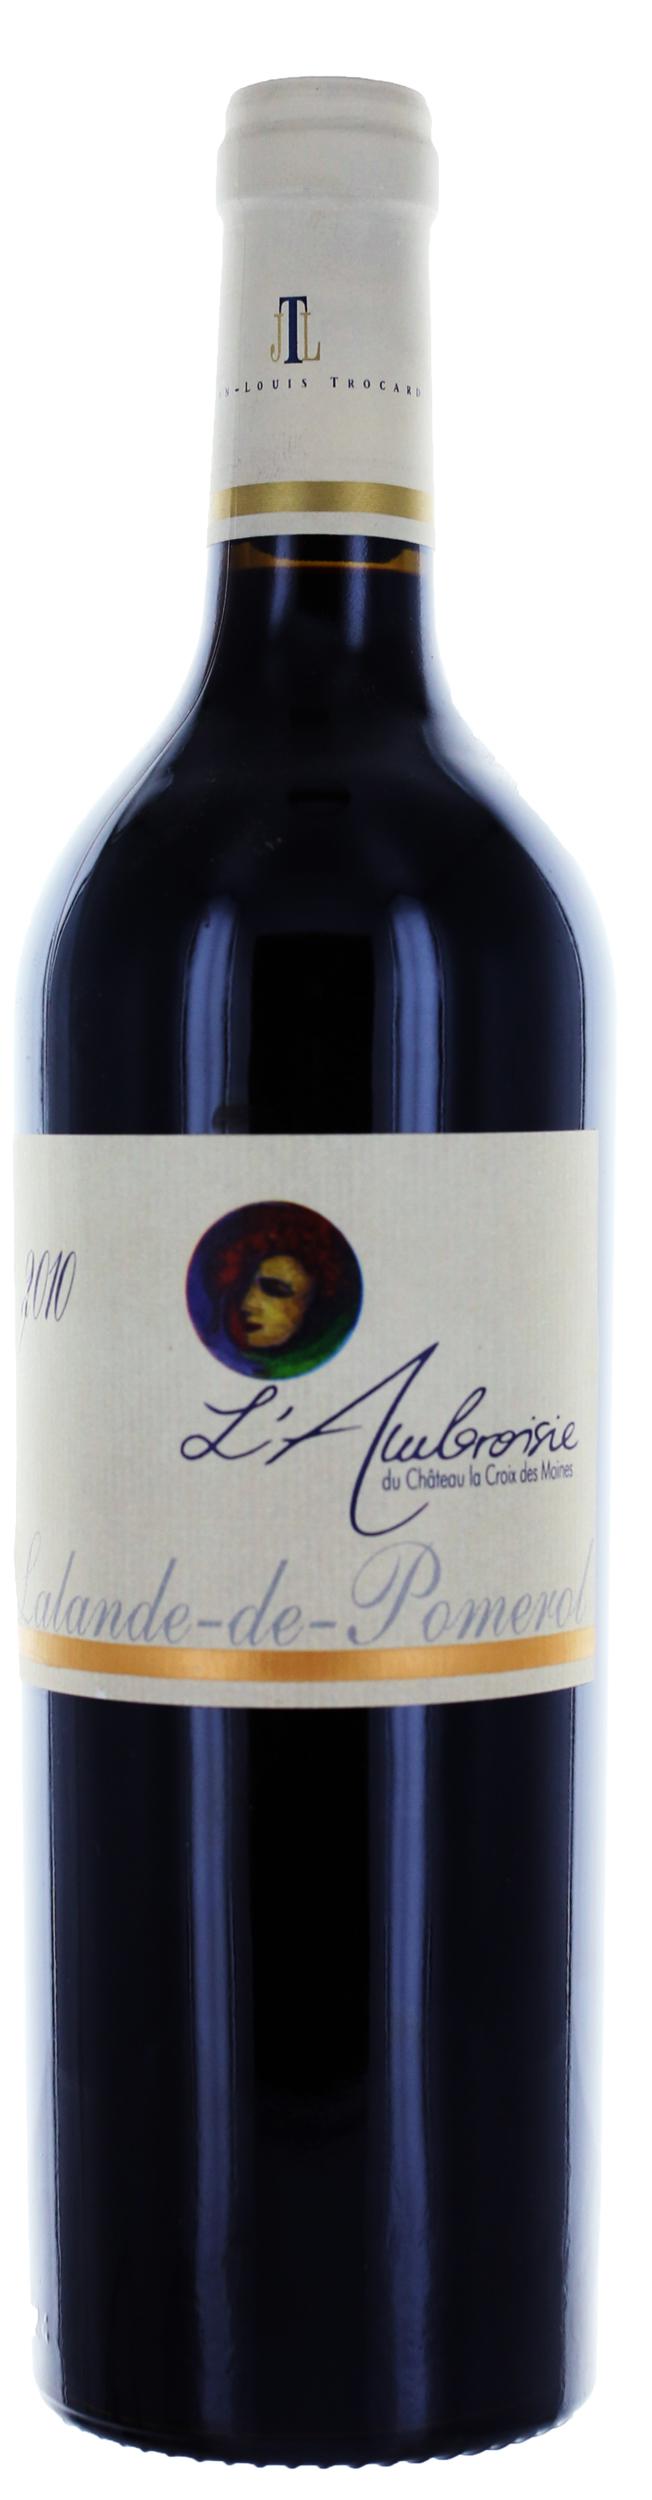 Lalande de Pomerol - L\'Ambroisie - Jean Louis Trocard - 2015